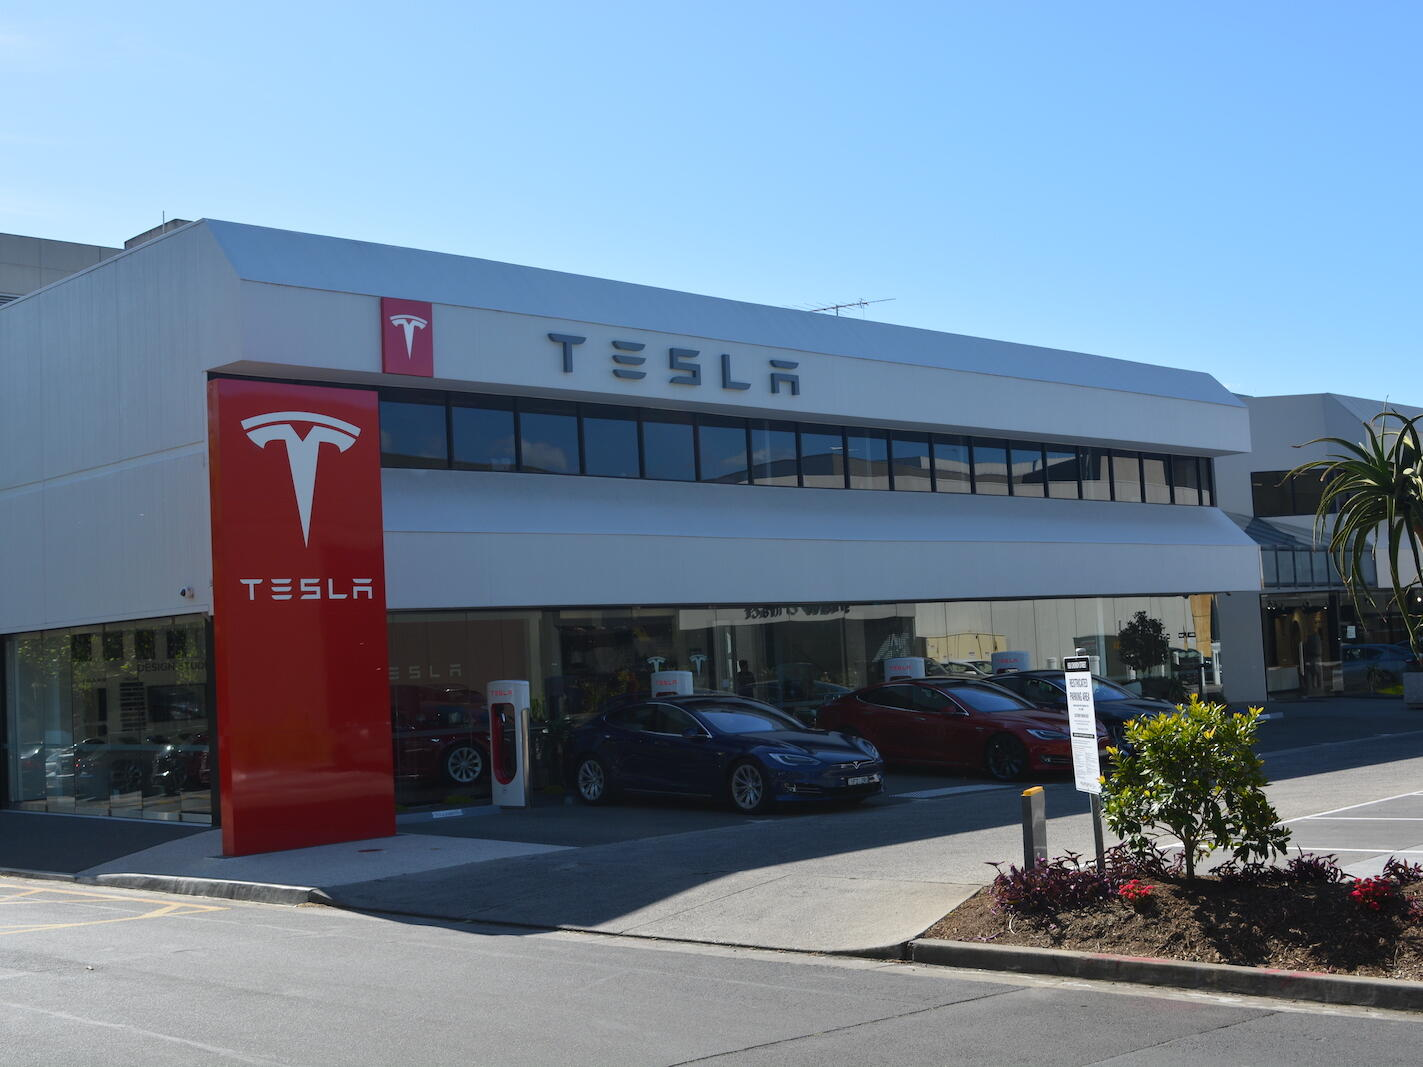 Exterior view of Tesla near the Strahan Village